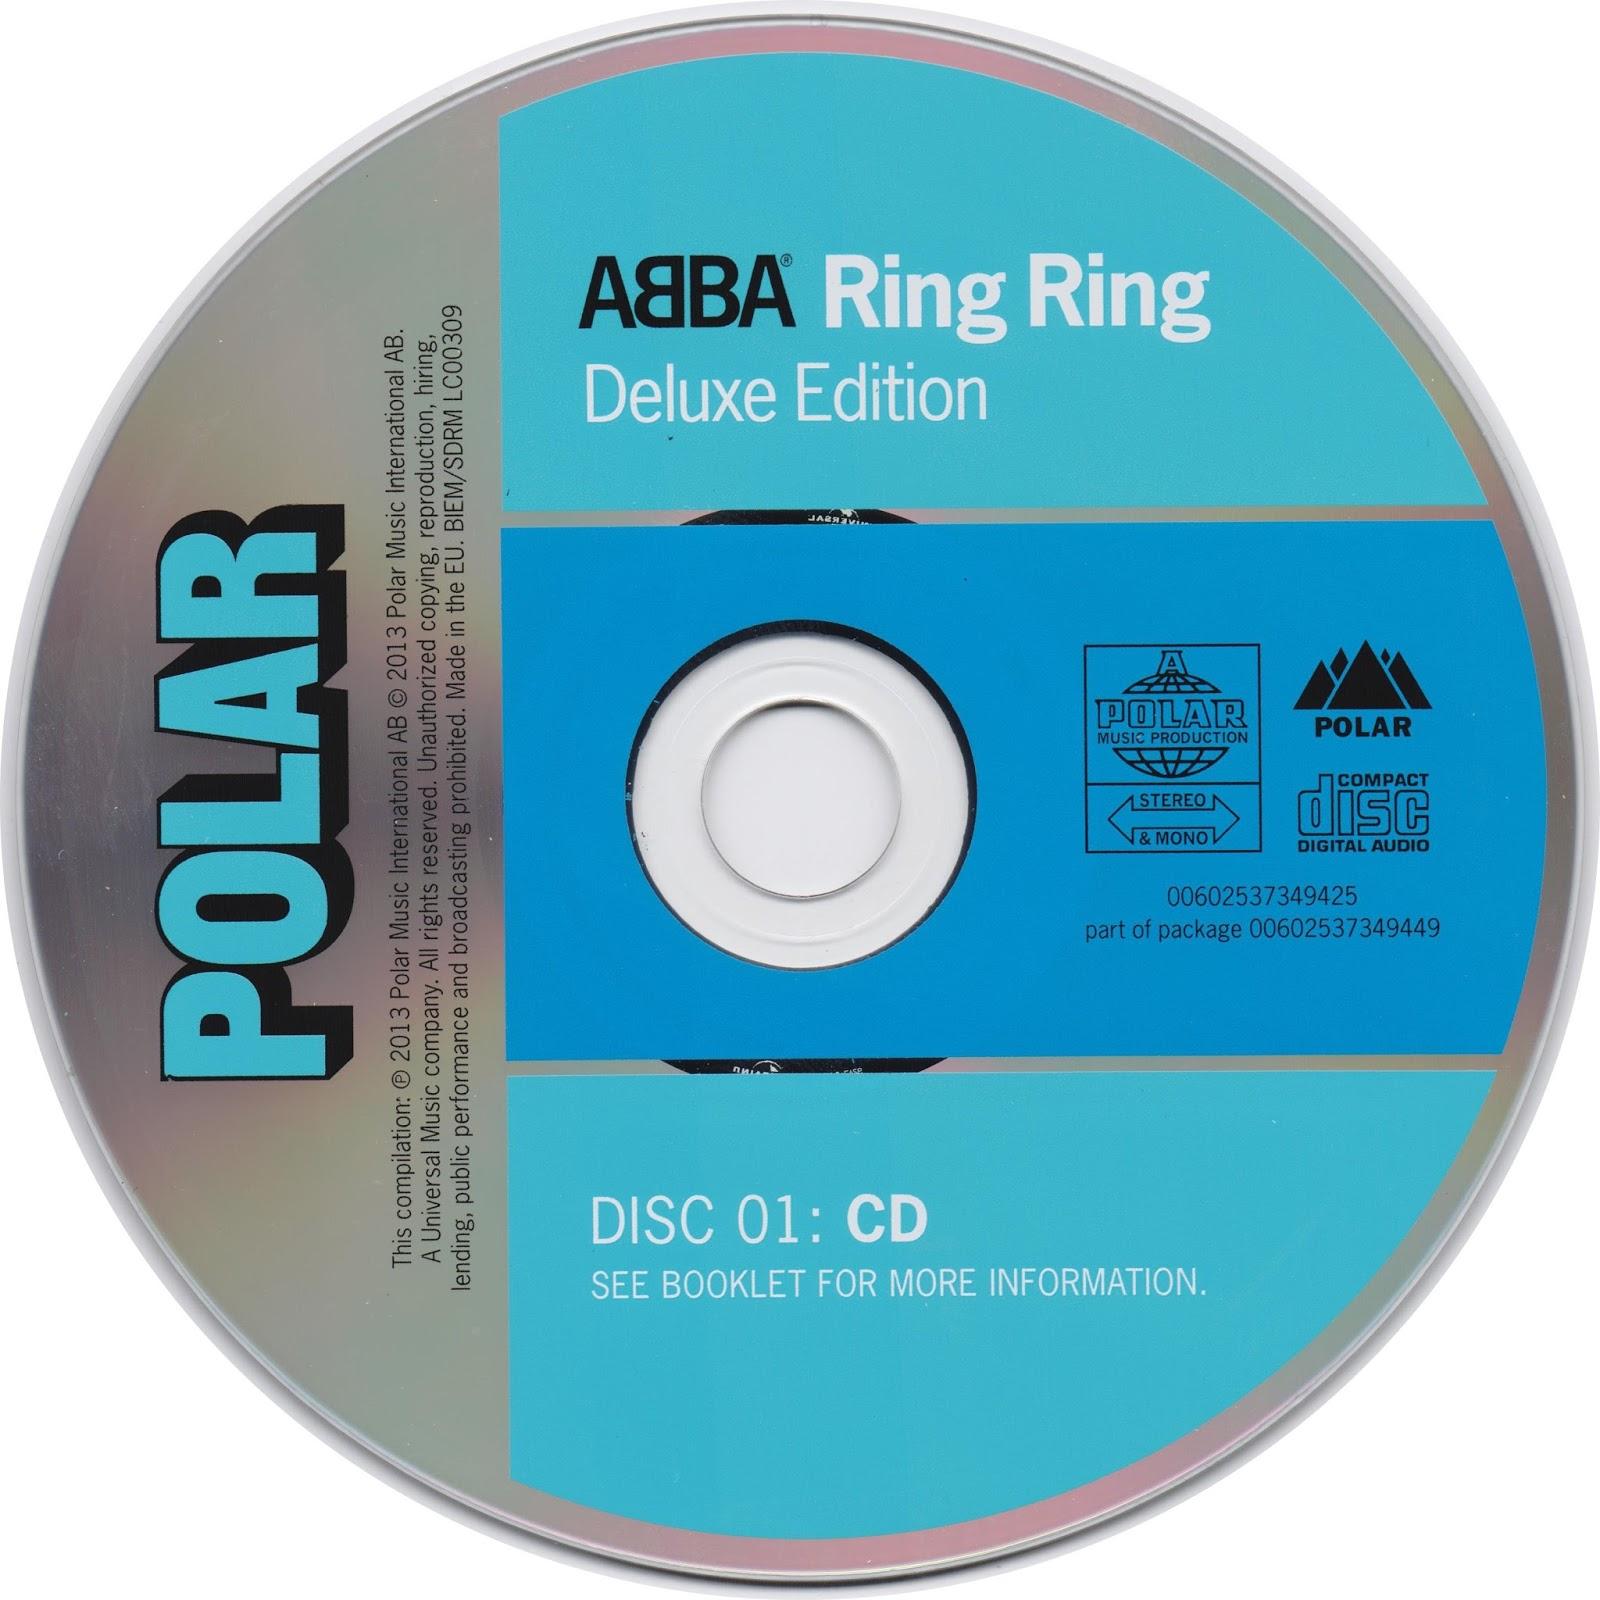 ABBA VISITORS BAIXAR THE CD